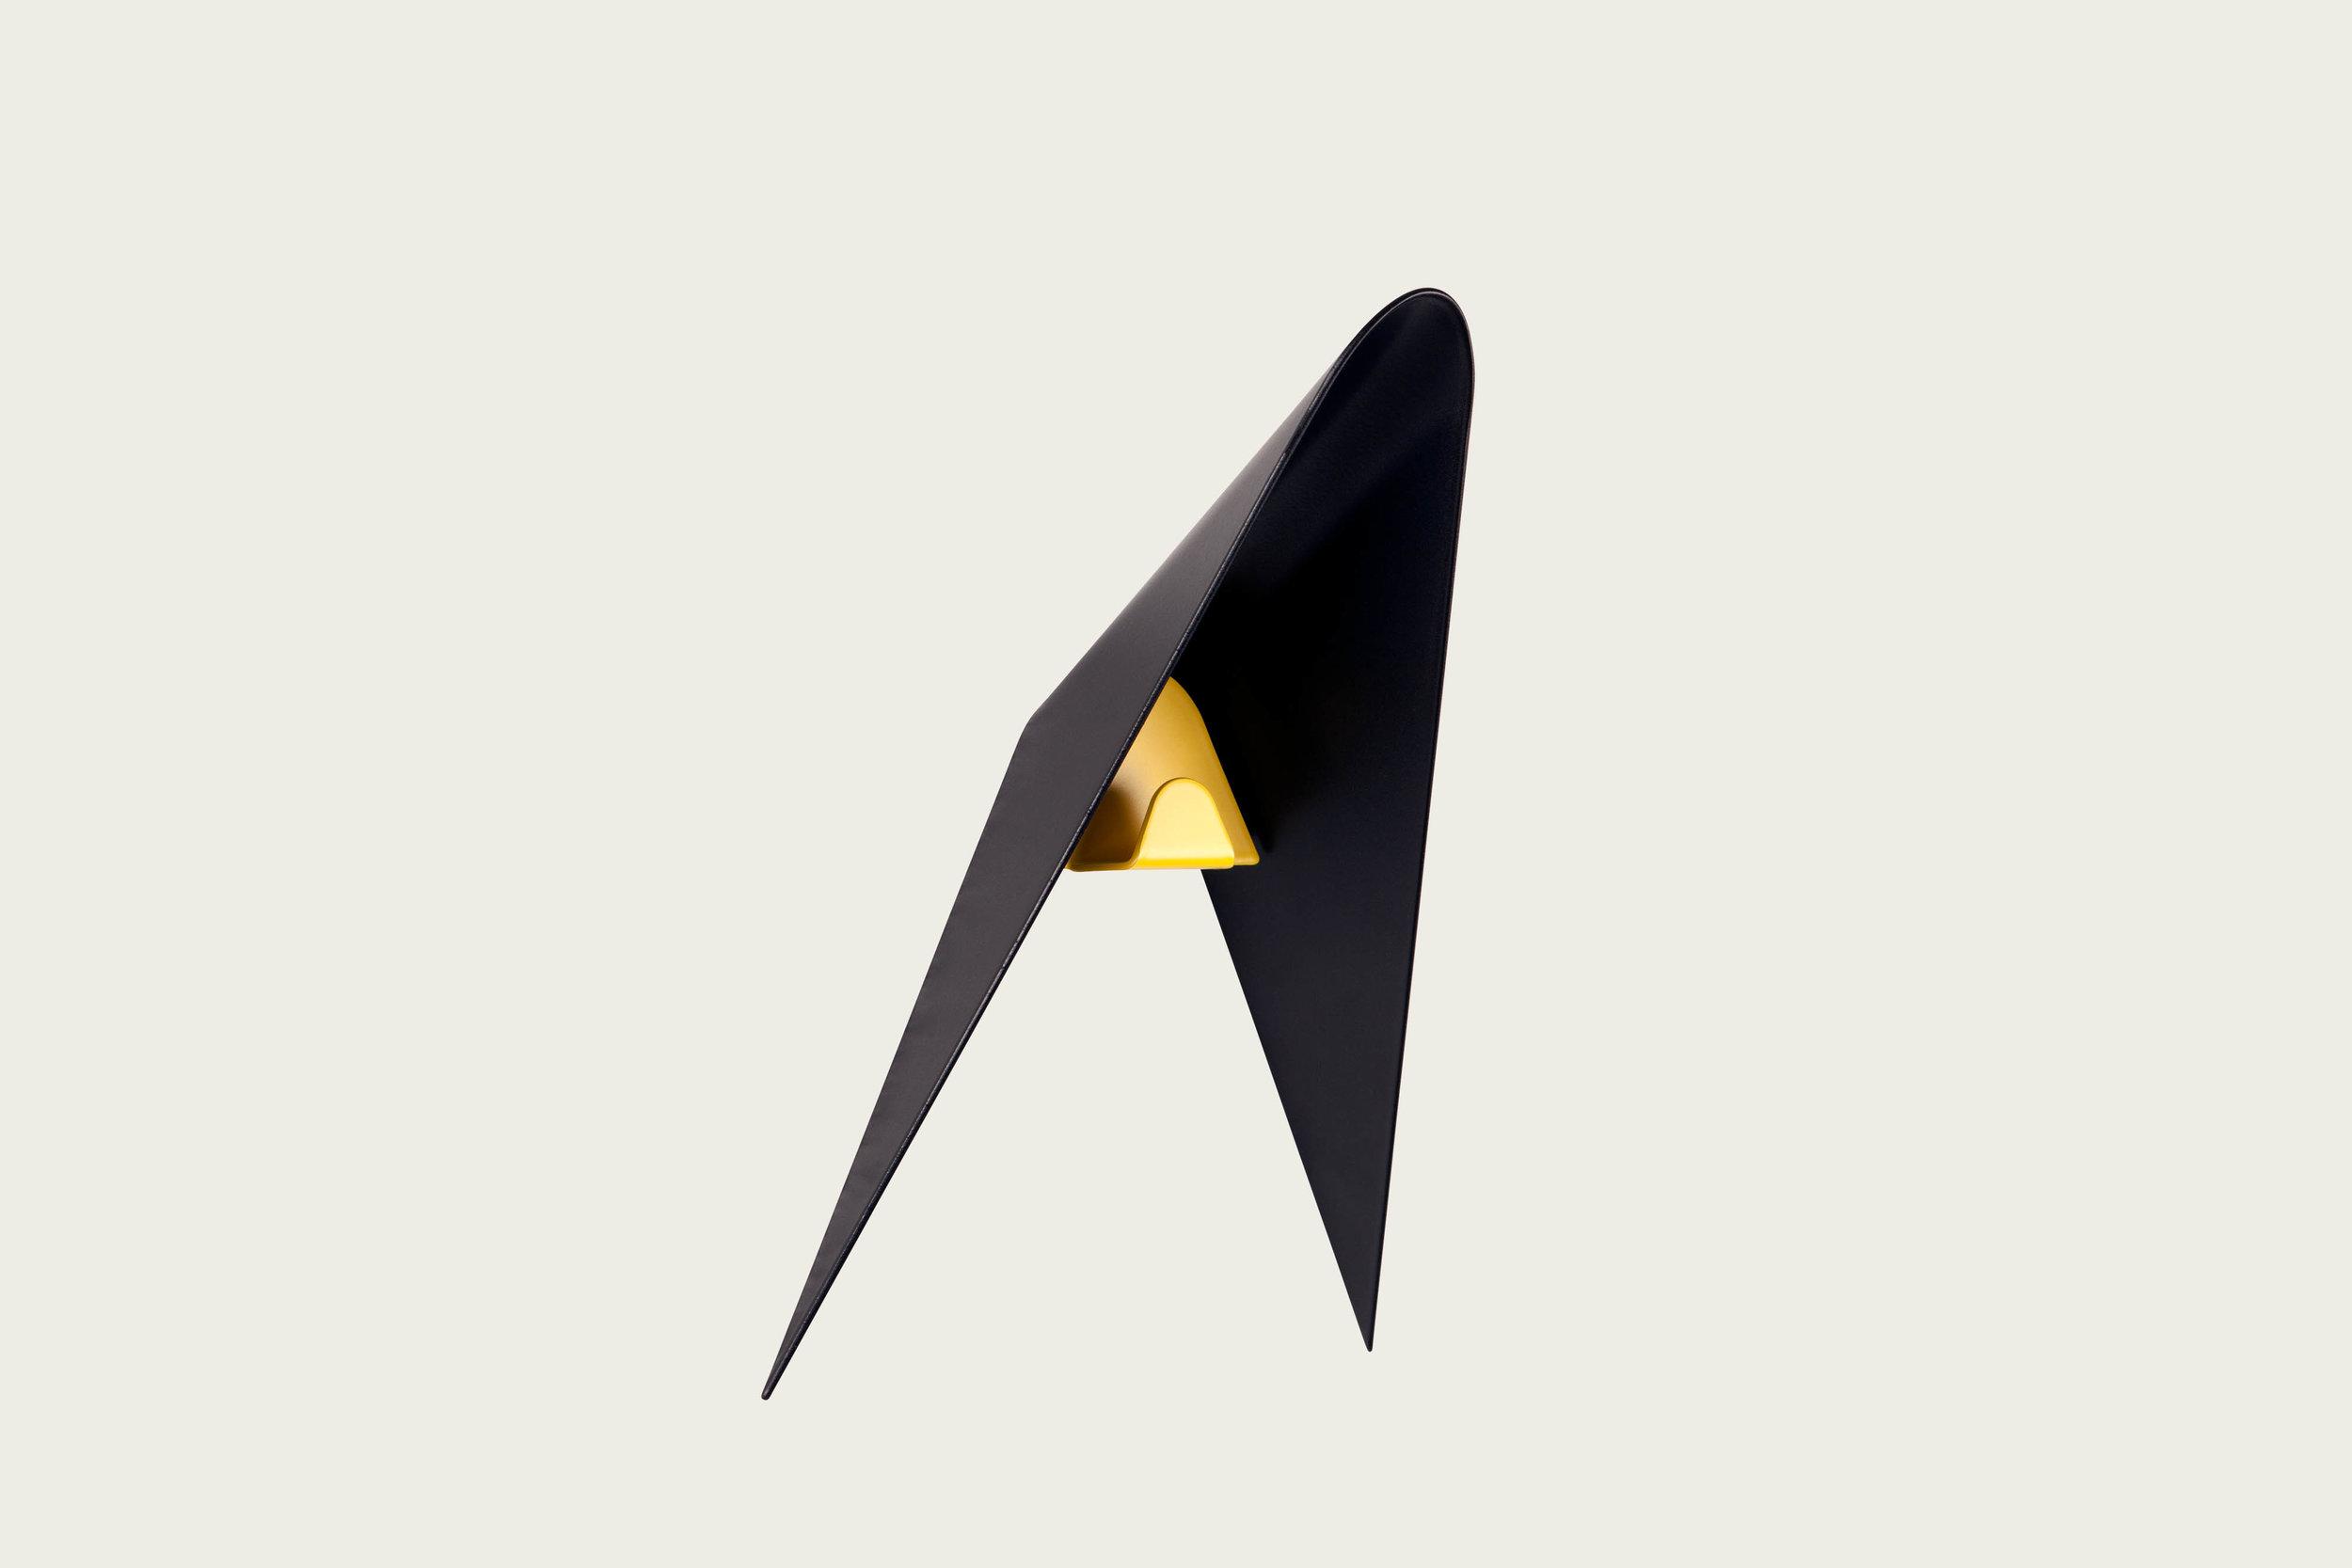 211114_2_AERO hook_ yellow_highres (1) kopier.jpg